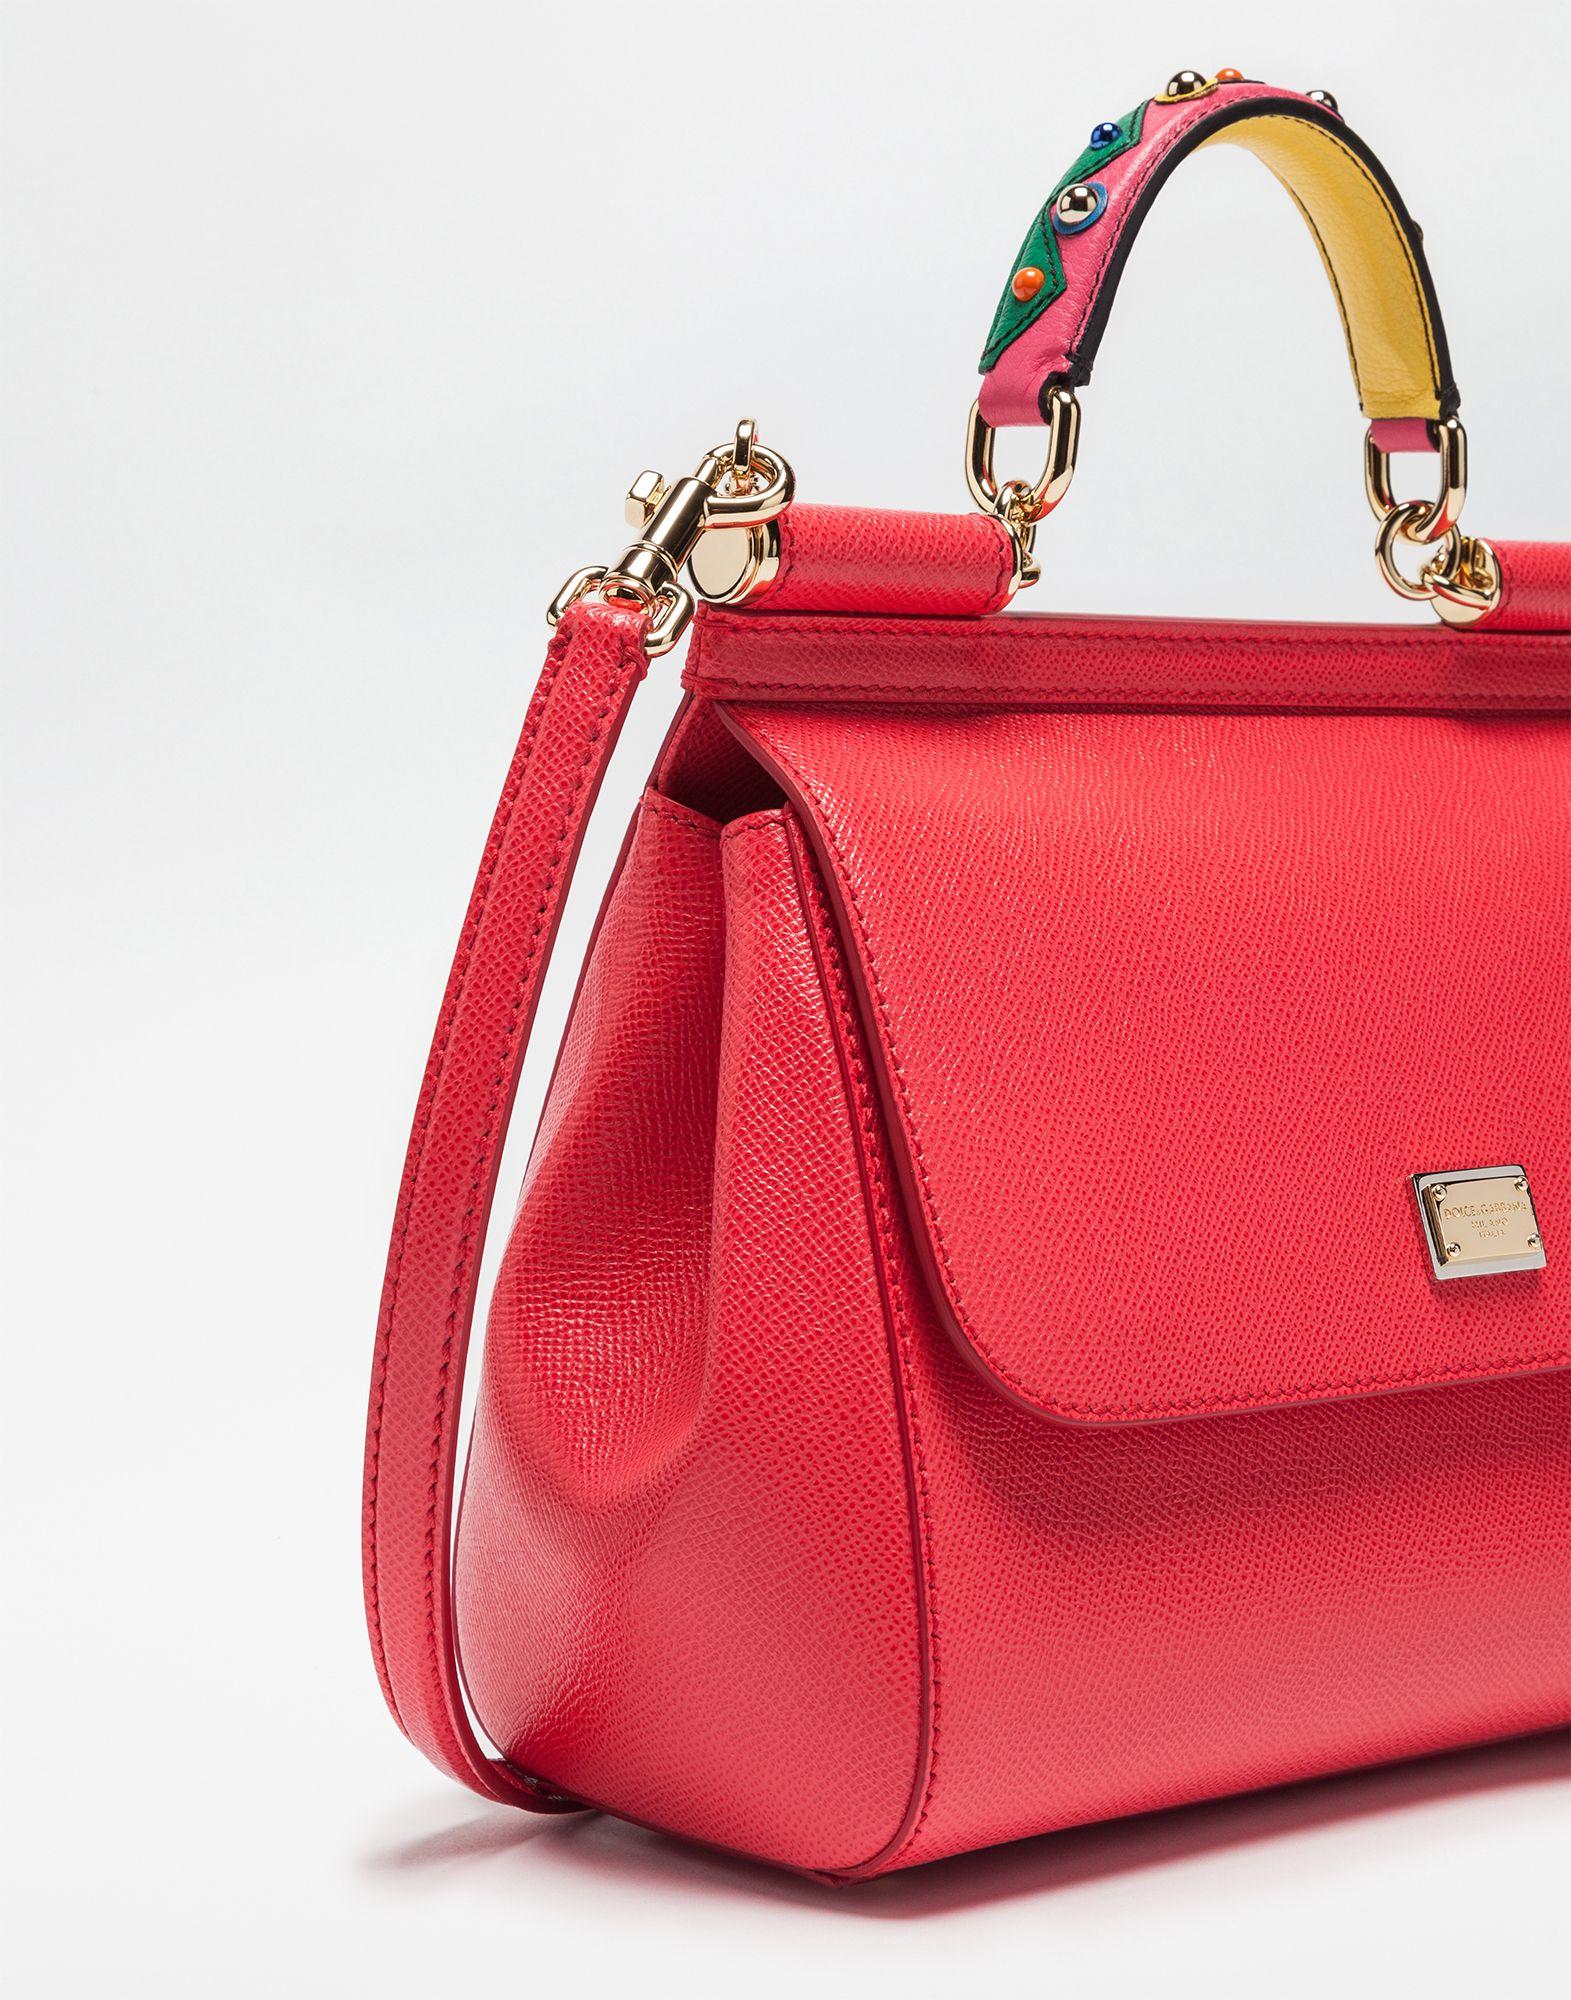 BORSA SICILY Dolce Gabbana MEDIA IN PELLE DAUPHINE CON MANICO RICAMATO de95eece45696